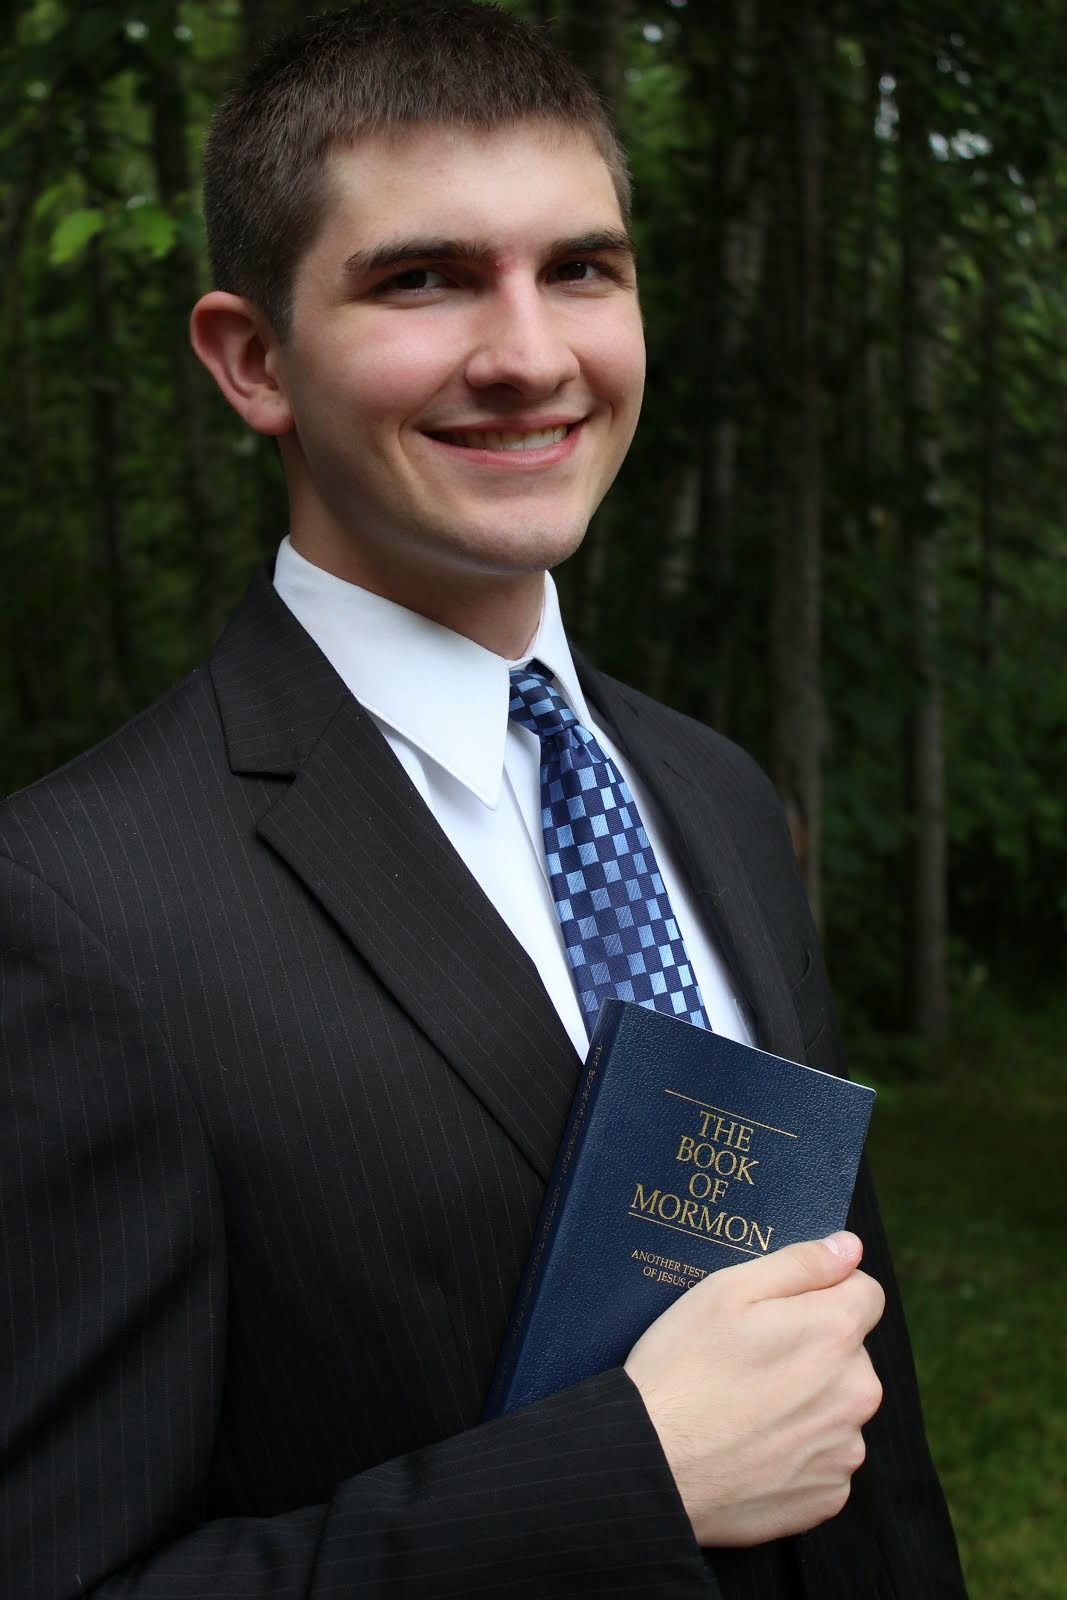 Elder Bates